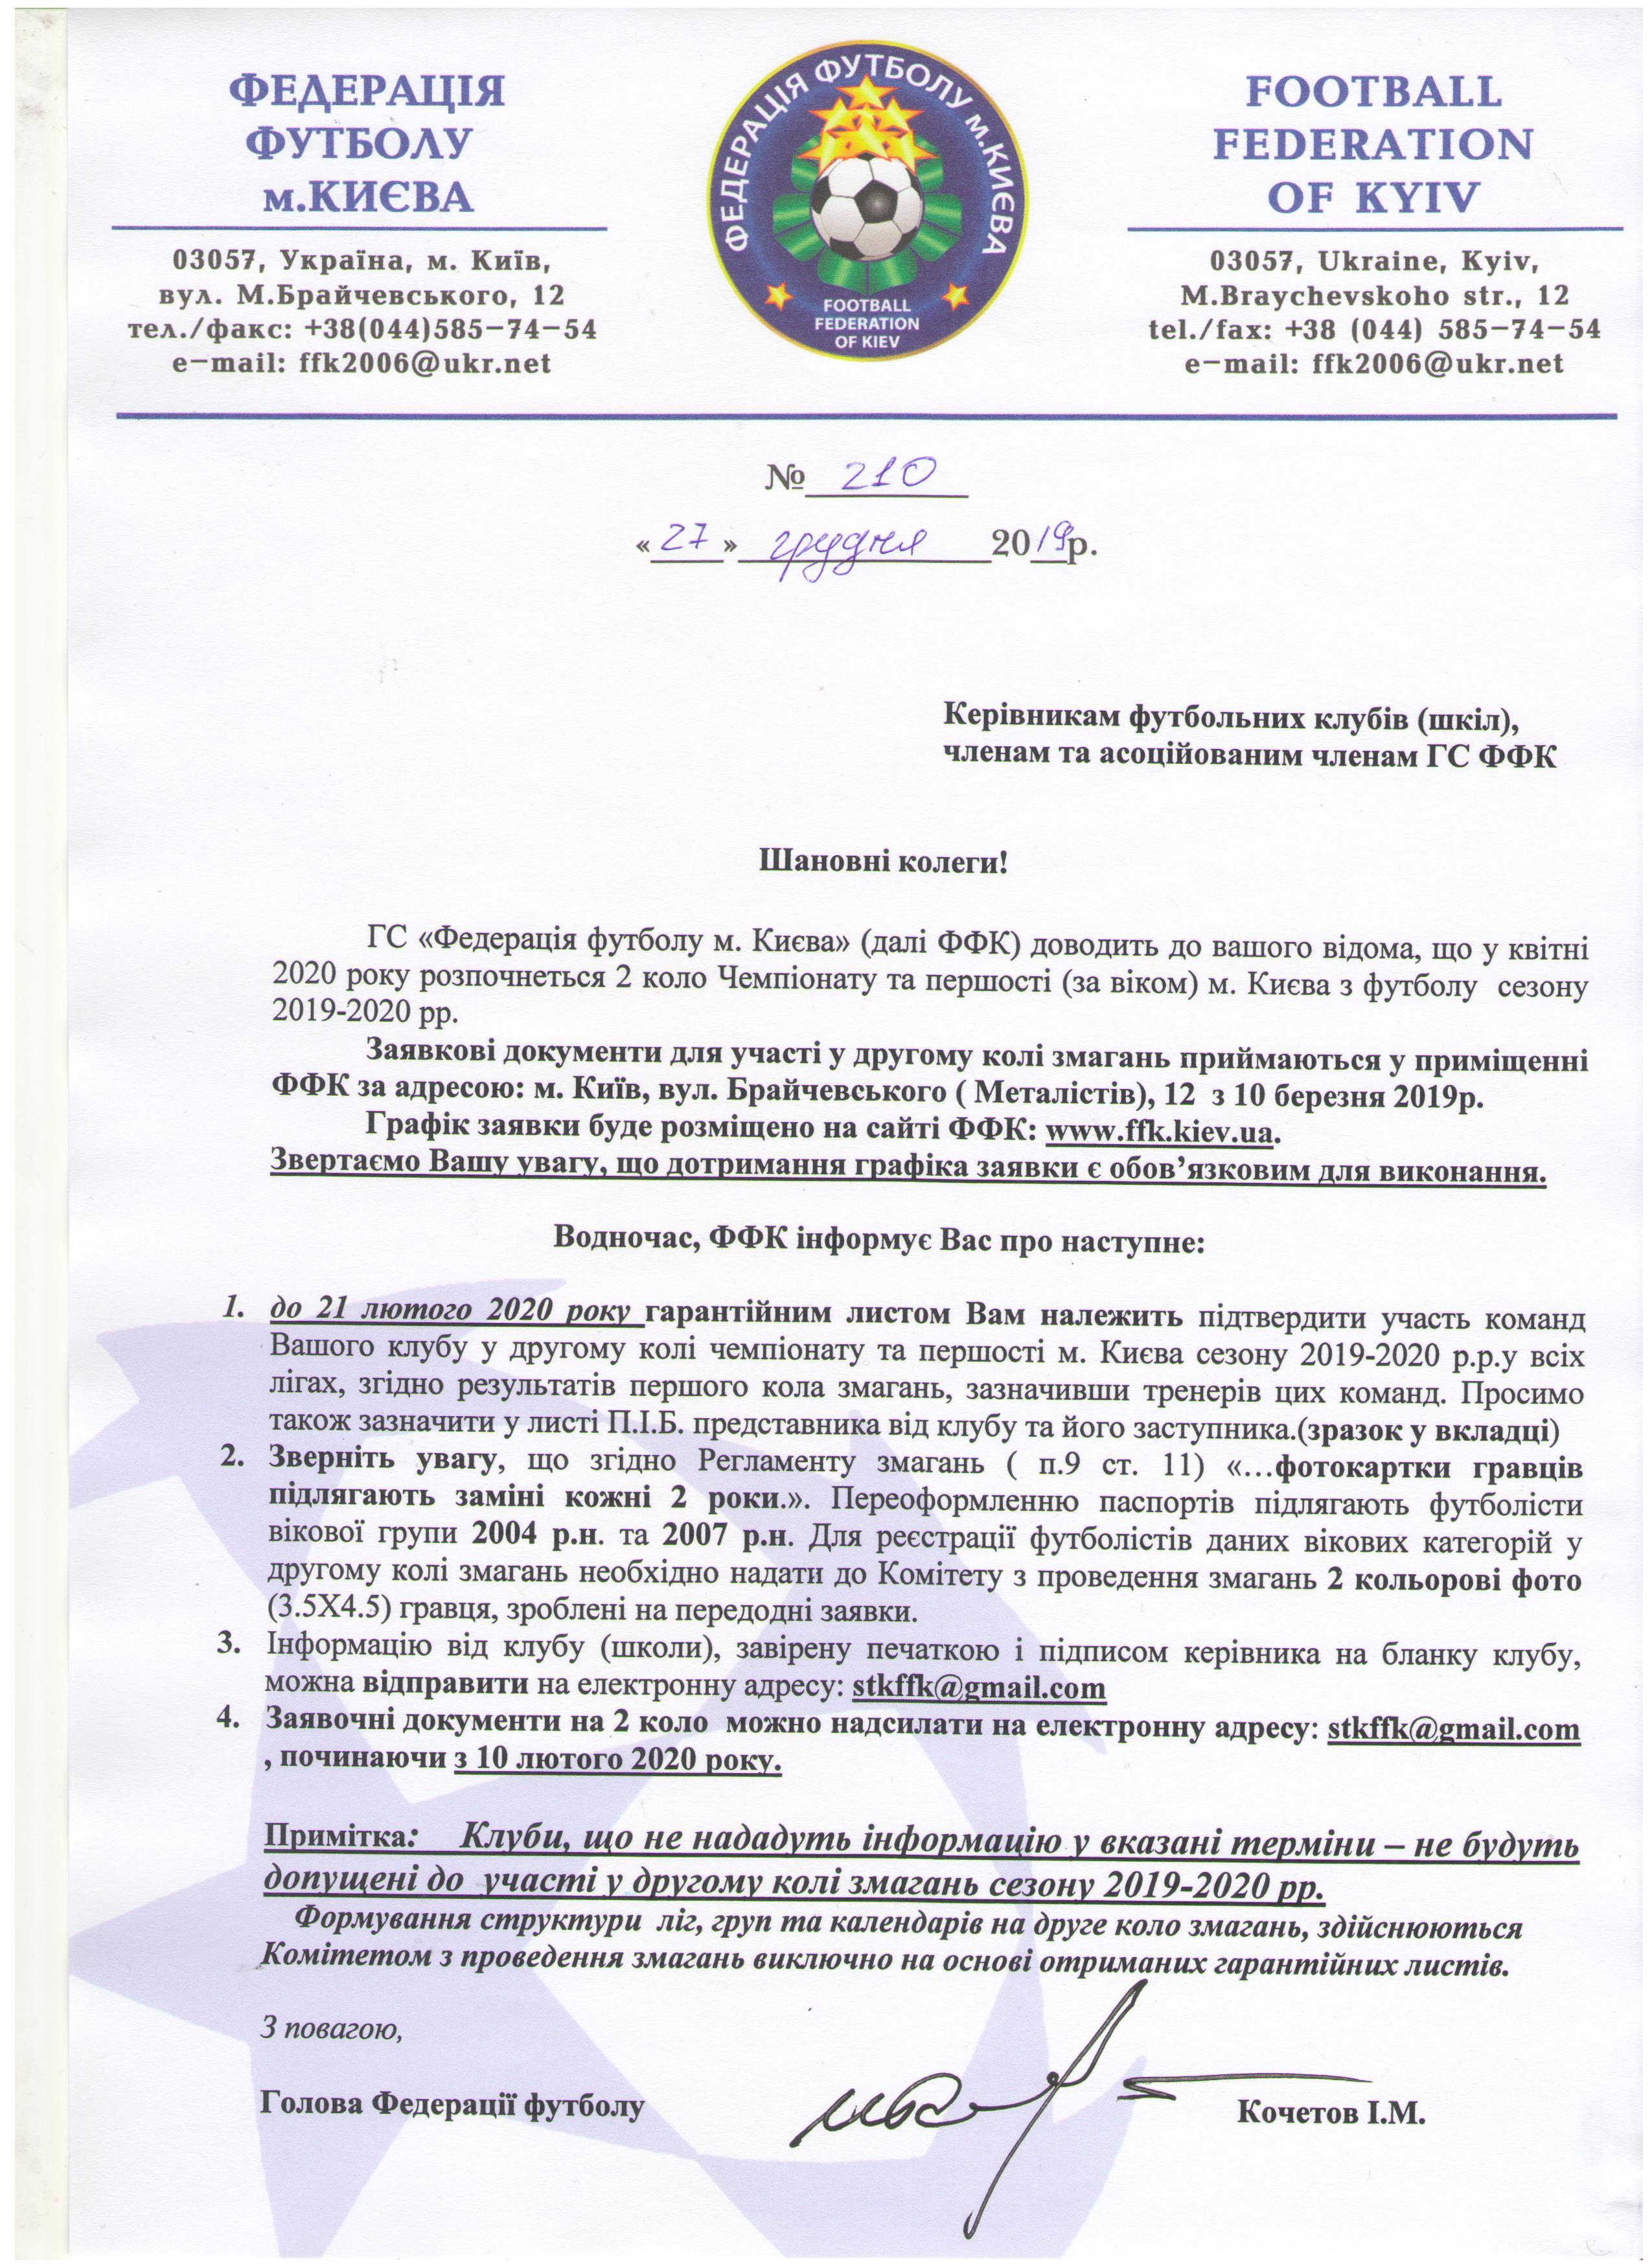 Керівнику футбольного клубу 2019-20 (2 коло) СТК